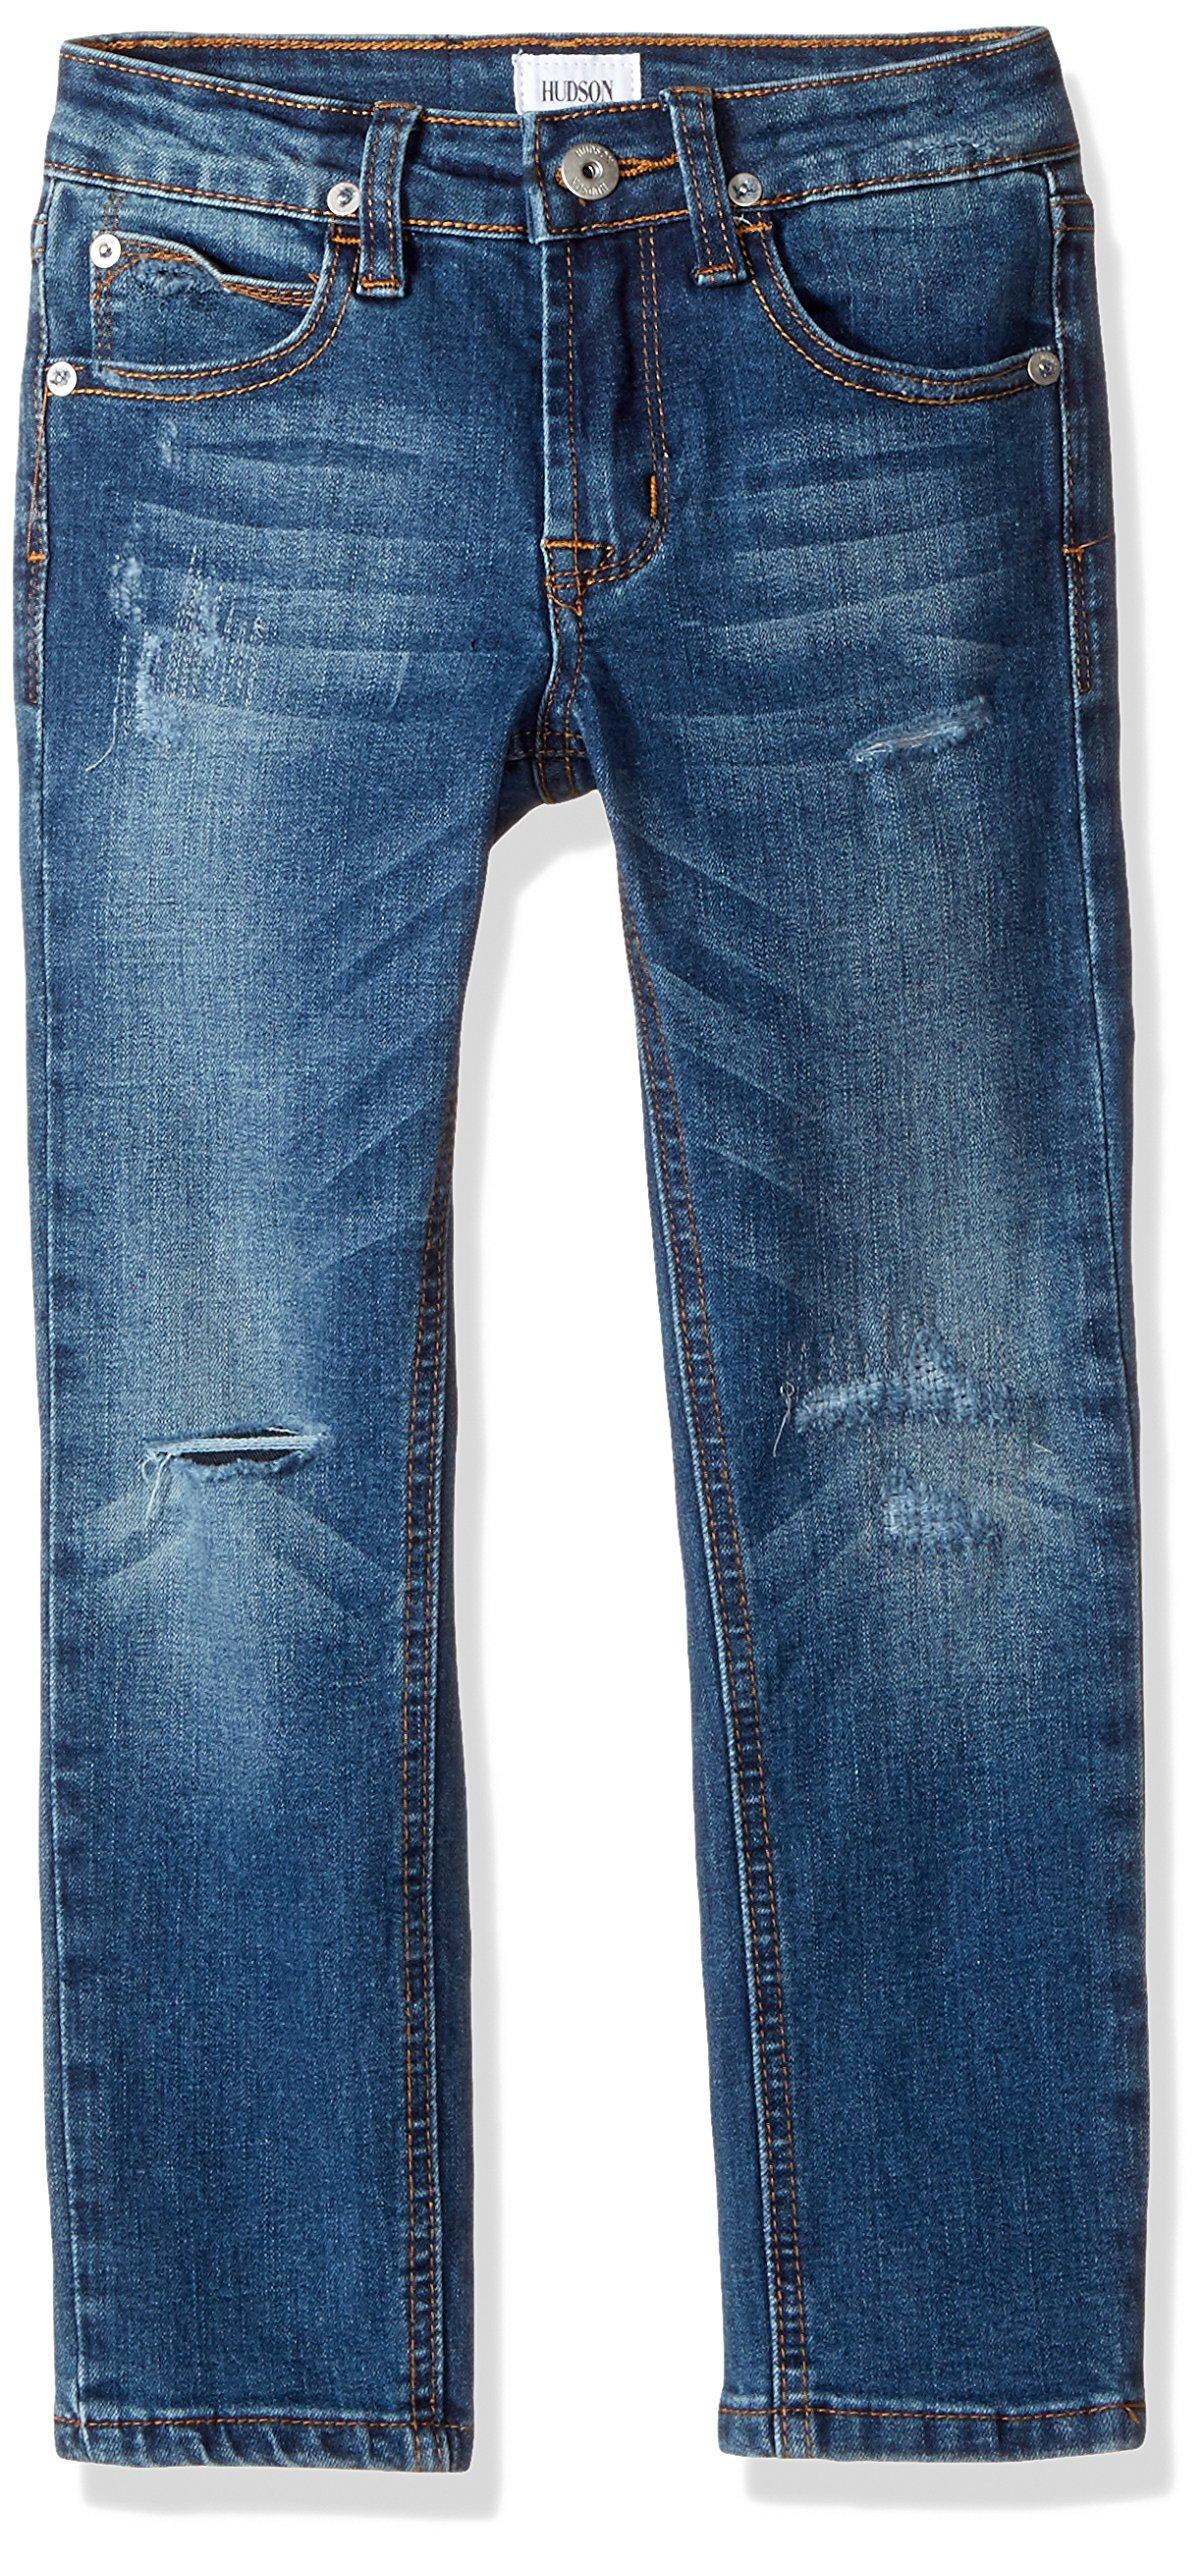 HUDSON Boys' Big Jagger Slim Straight Jean, Cielo, 20 by HUDSON